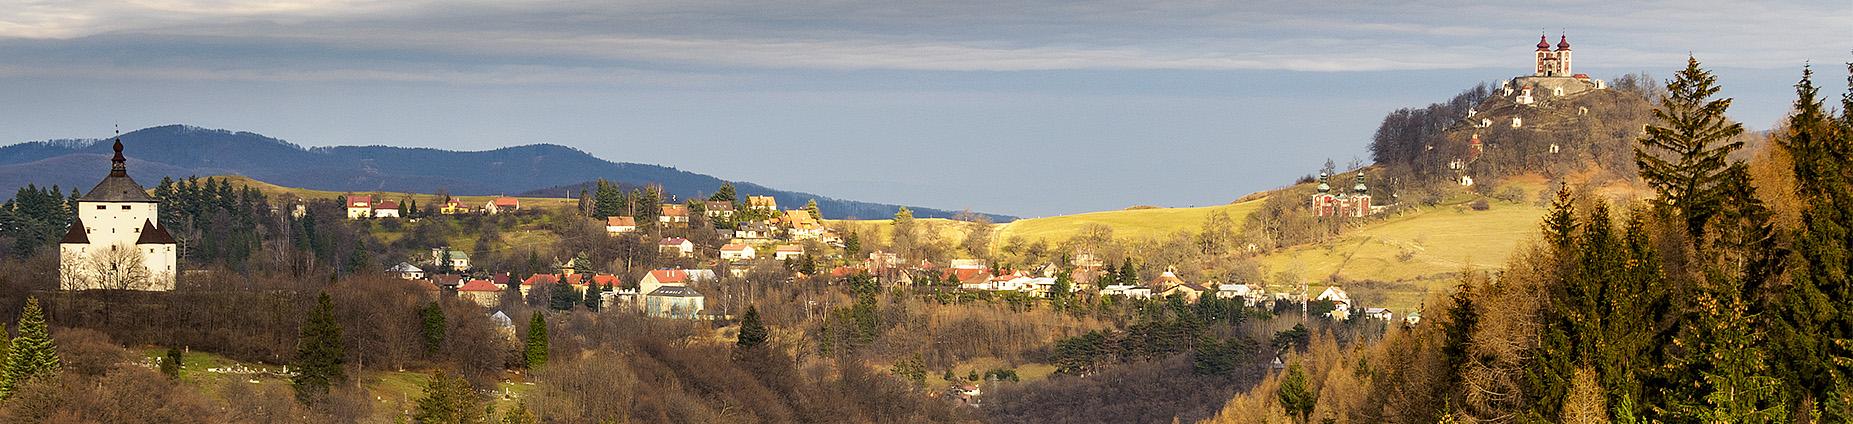 Obrazok Stiavnicke vrchy